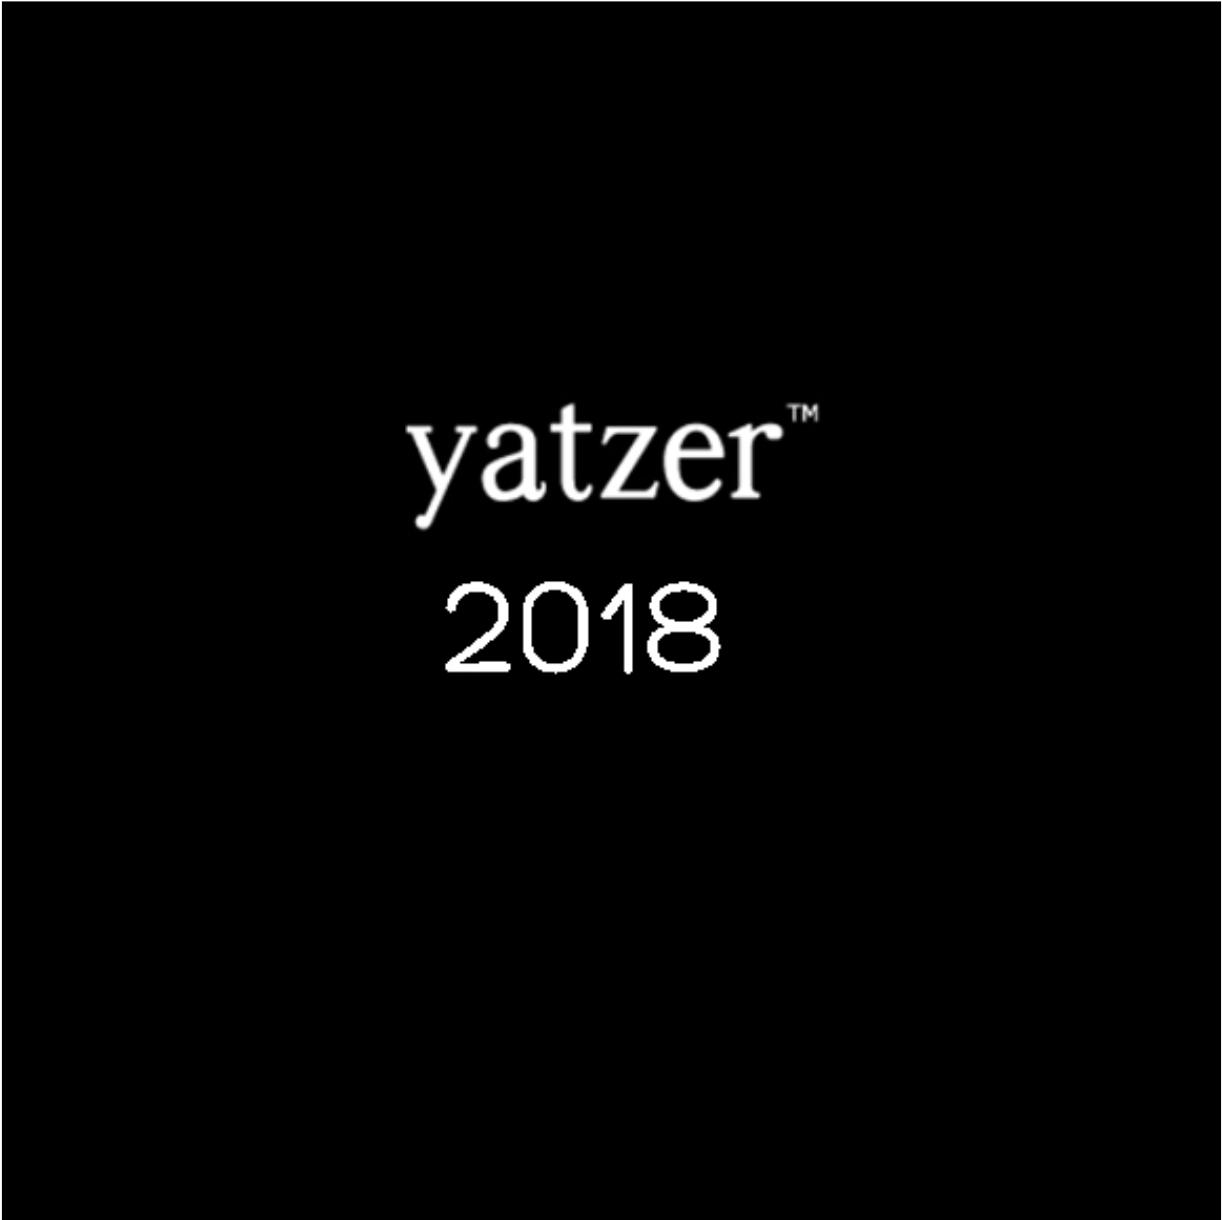 YATZER